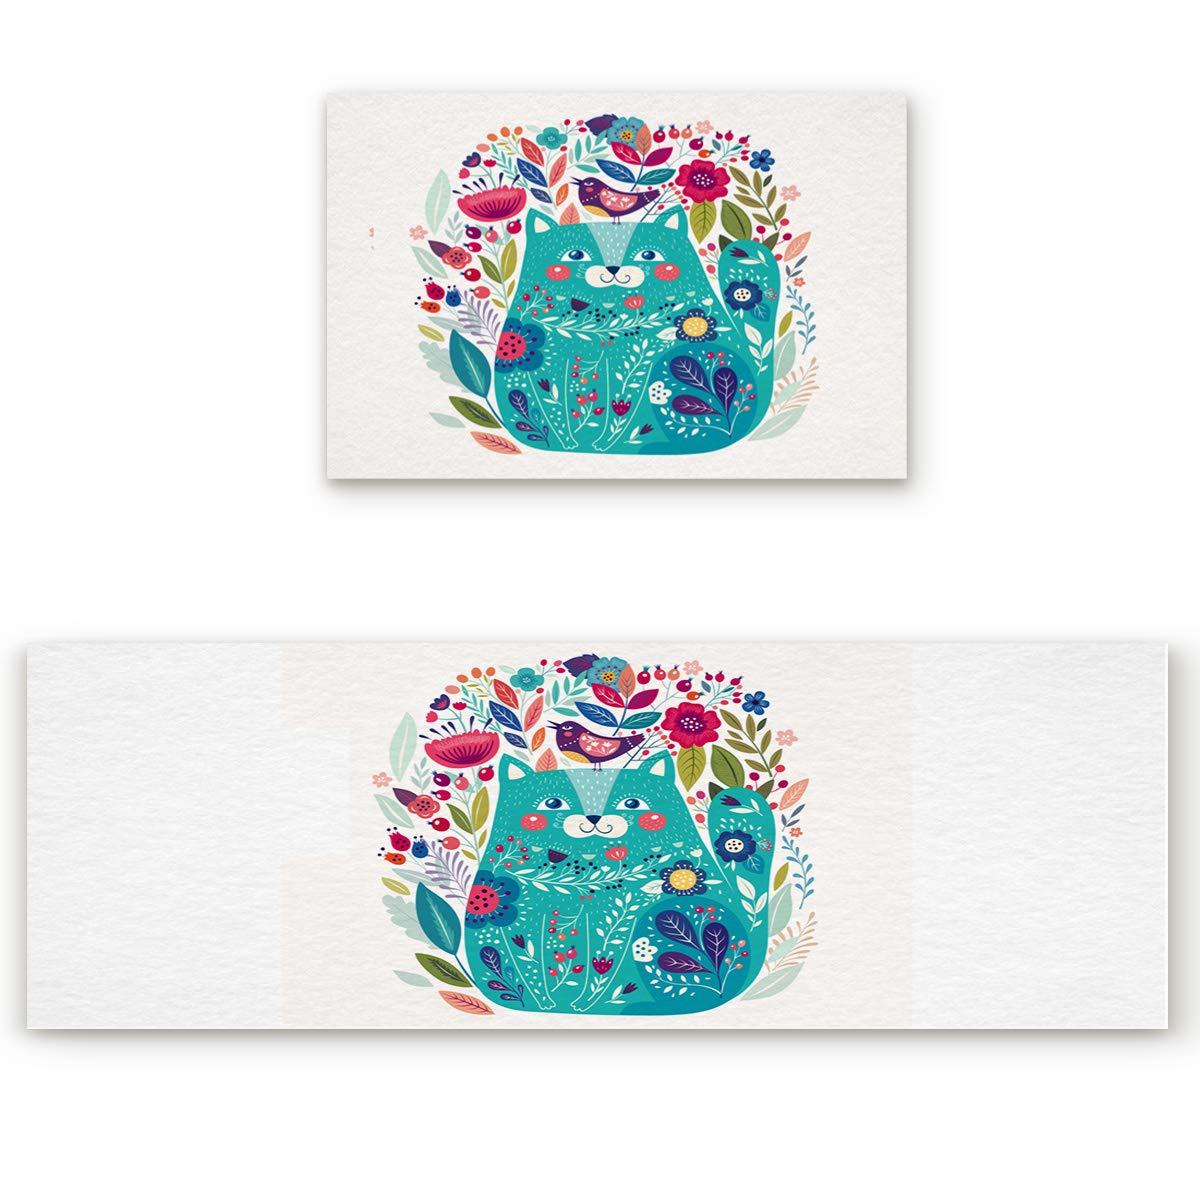 blueeflowercat1san8410 19.7\ Savannan 2 Piece Non-Slip Kitchen Bathroom Entrance Mat Absorbent Durable Floor Doormat Runner Rug Set - Floral bluee Cat Flower